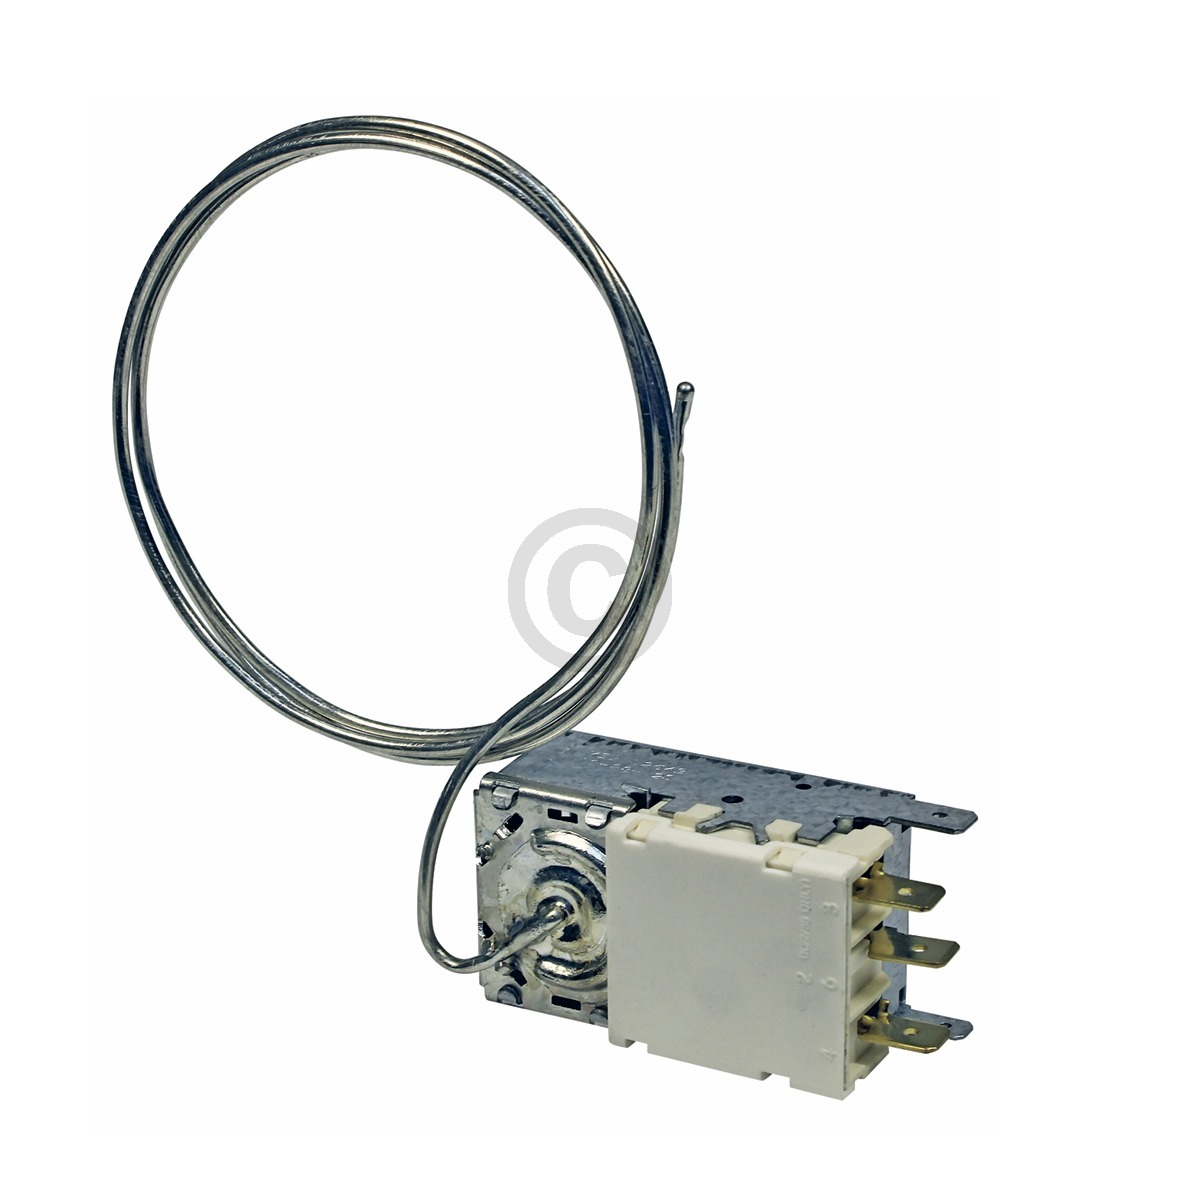 Thermostat K59-L2643 Ranco, OT! 226232303 AEG, Electrolux, Juno, Zanussi, Küpper